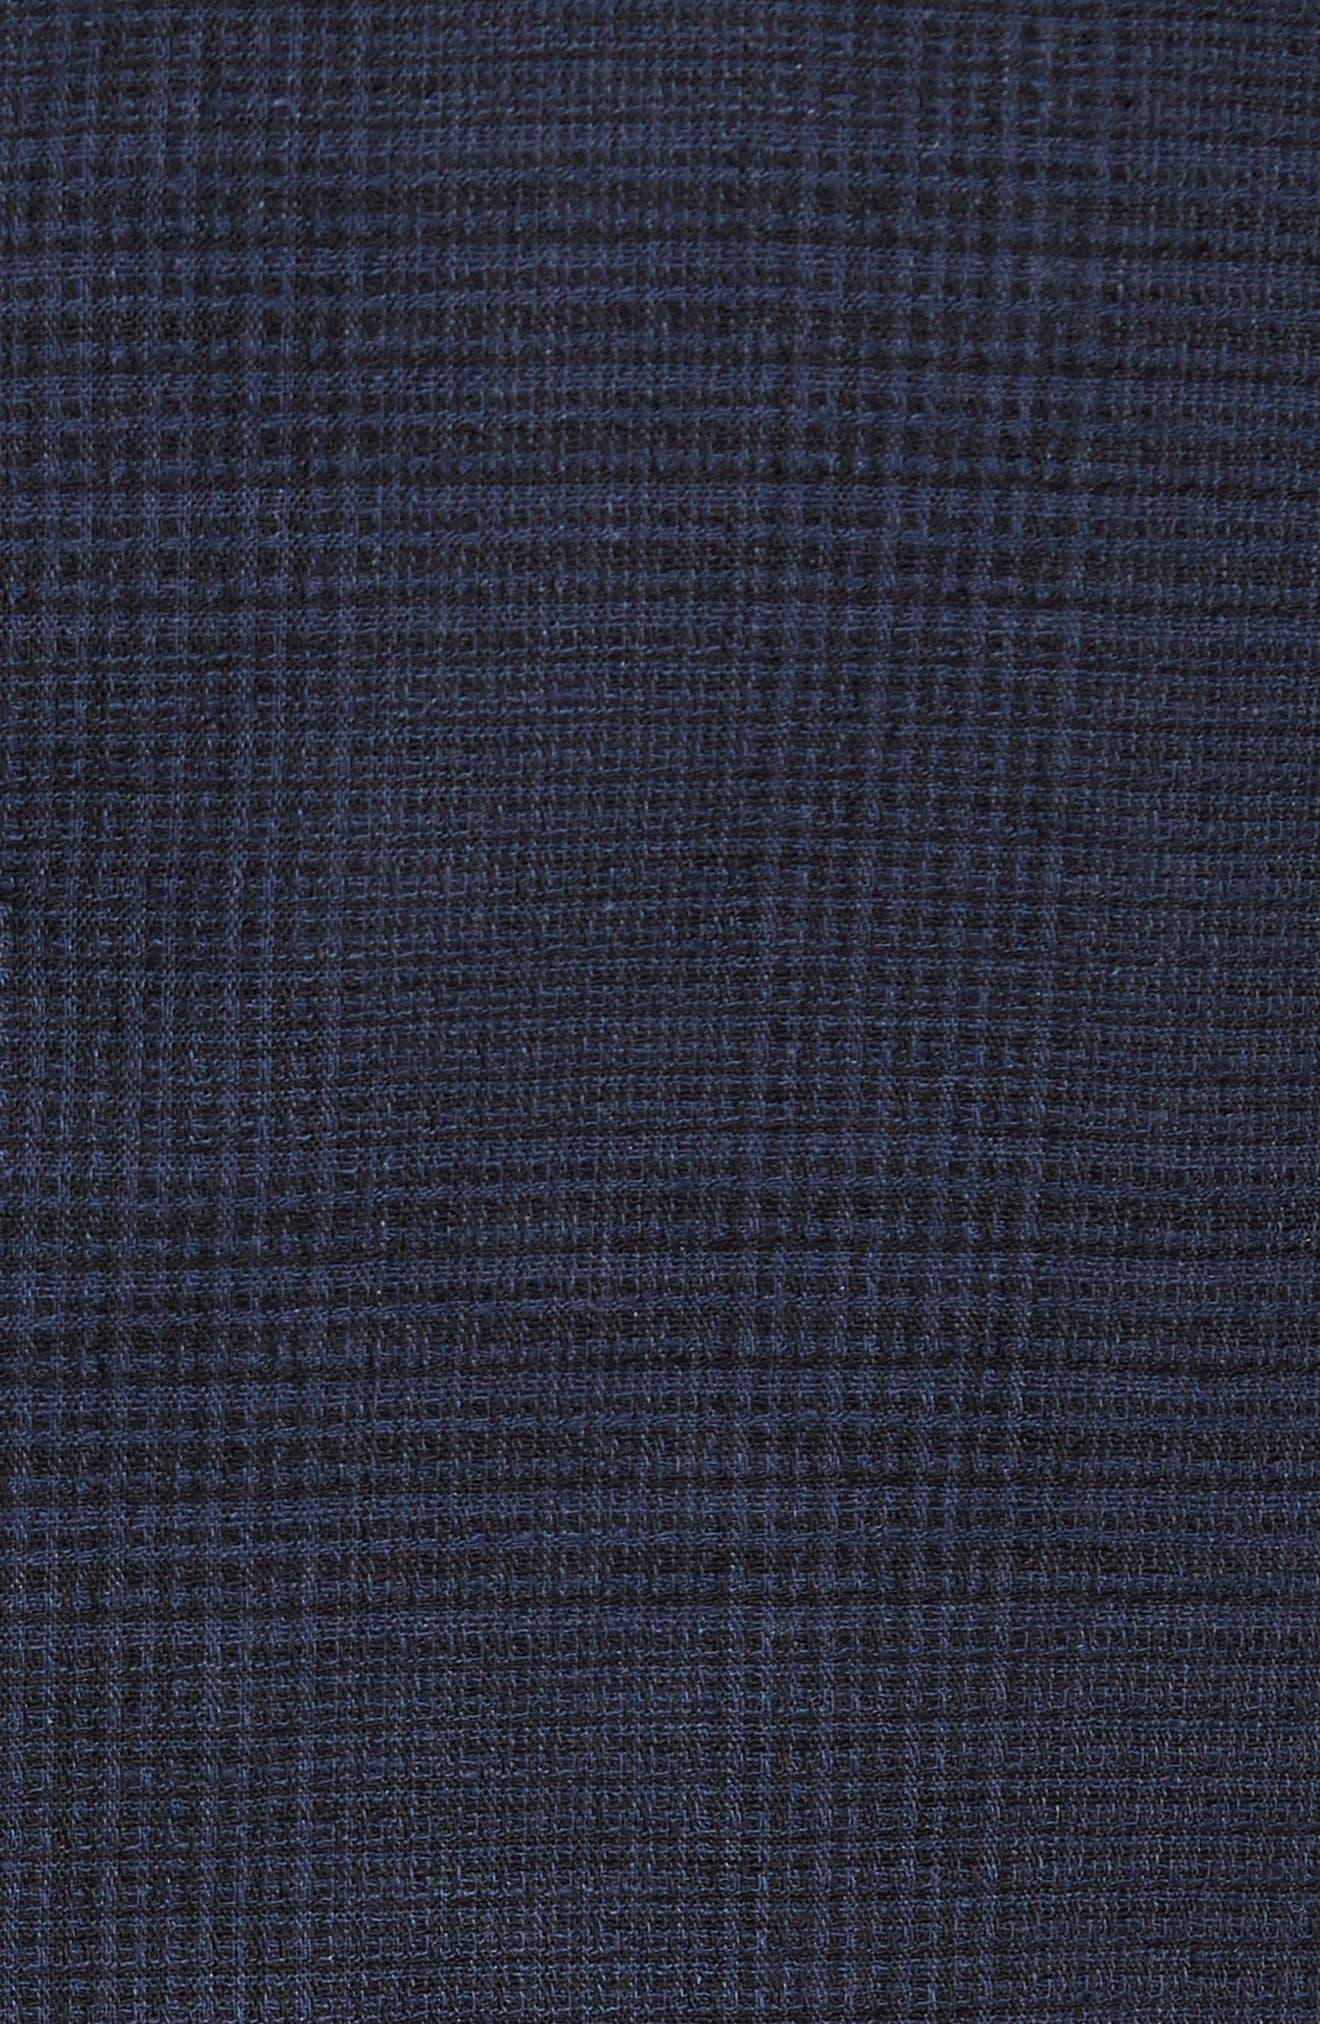 Delaria Plaid Wool Blend Jacket,                             Alternate thumbnail 10, color,